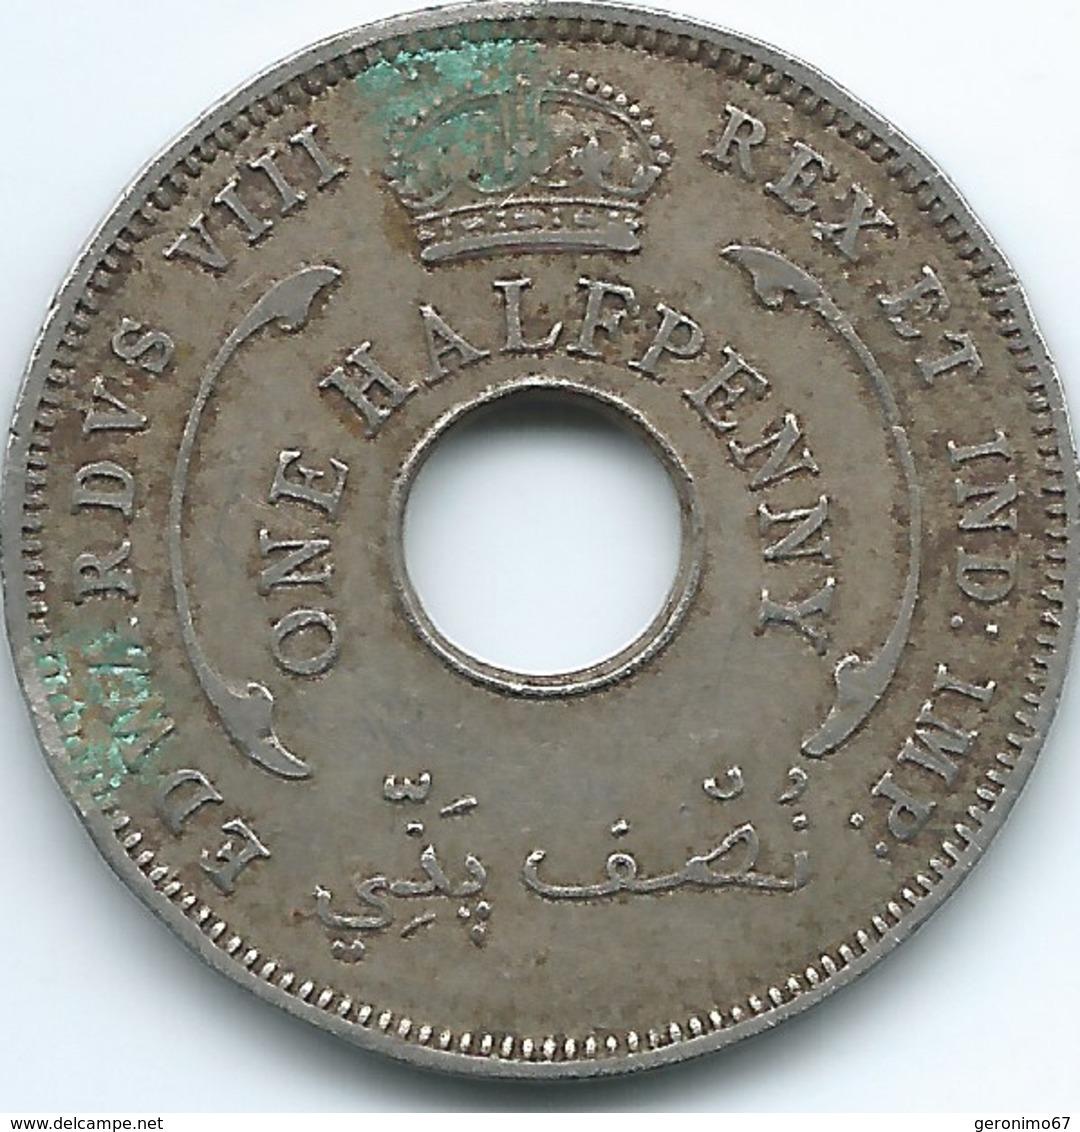 British West Africa - 1936 - Edward VIII - ½ Penny - KM15 - Colonies